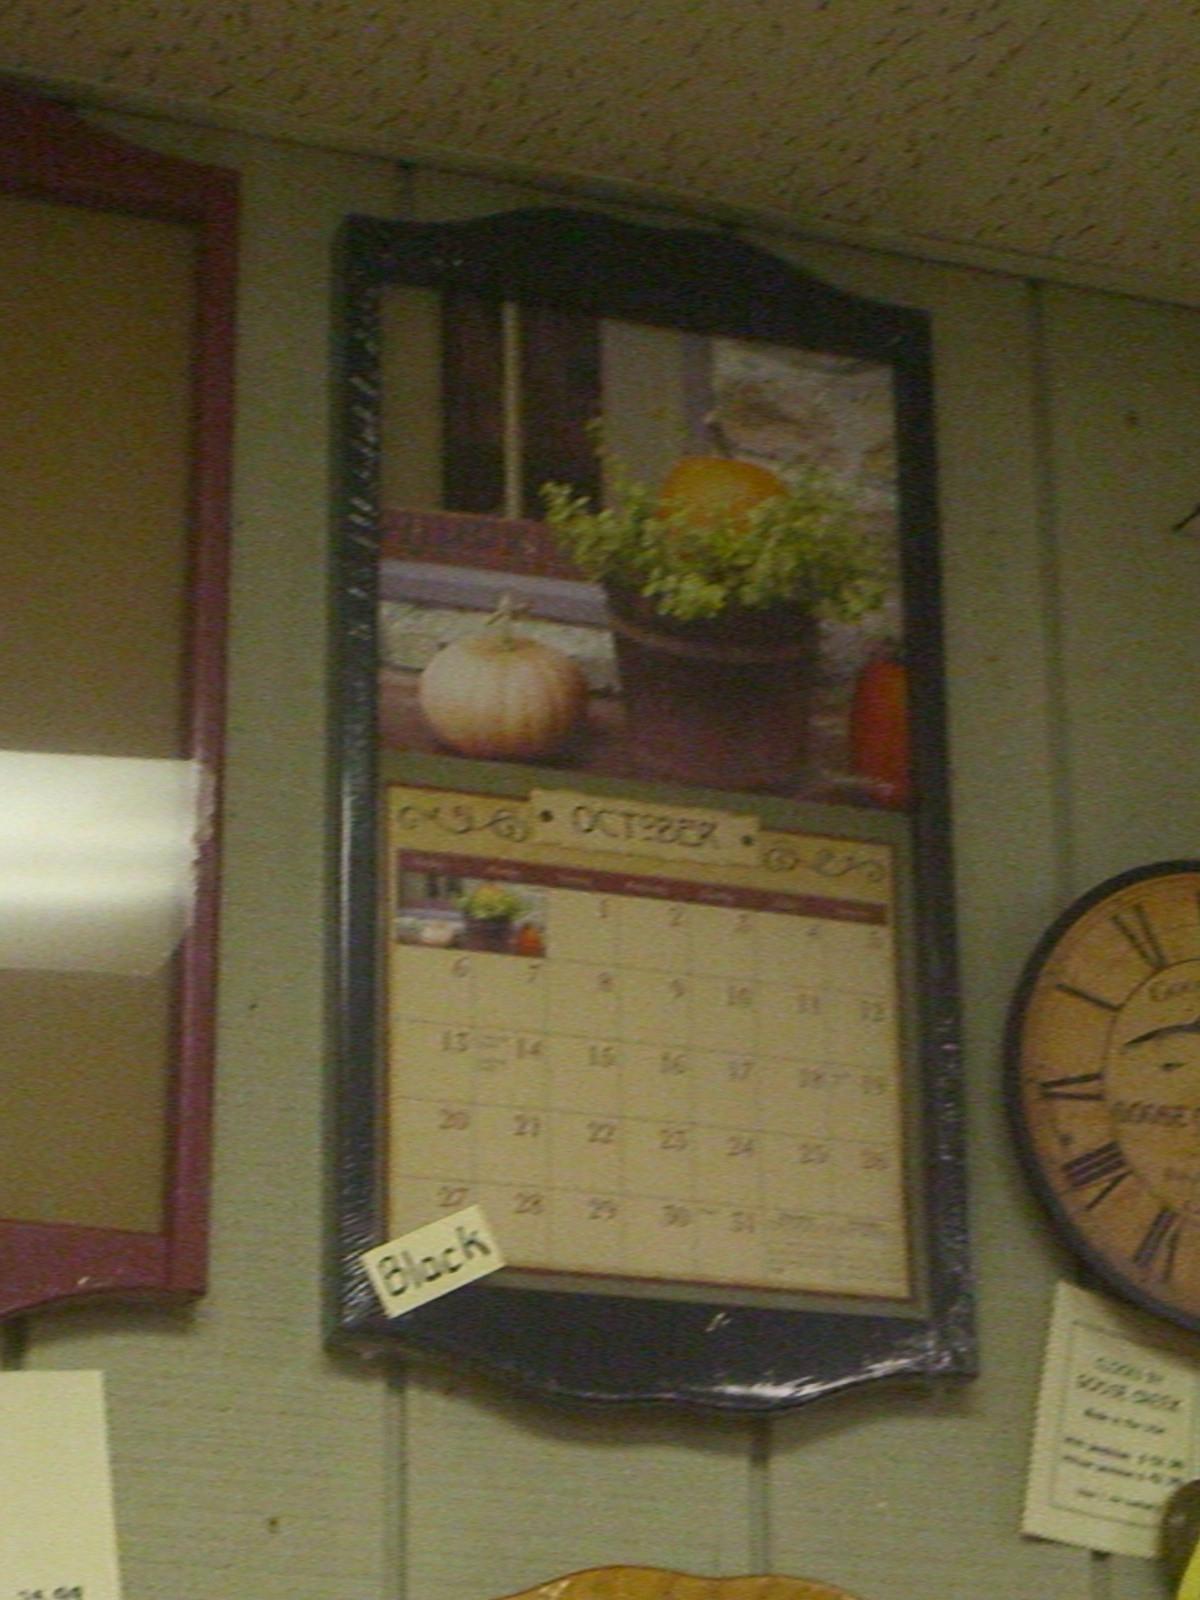 Wall Calendar Frames And Holders - Calendar Inspiration Design  Calendar Frames And Holders